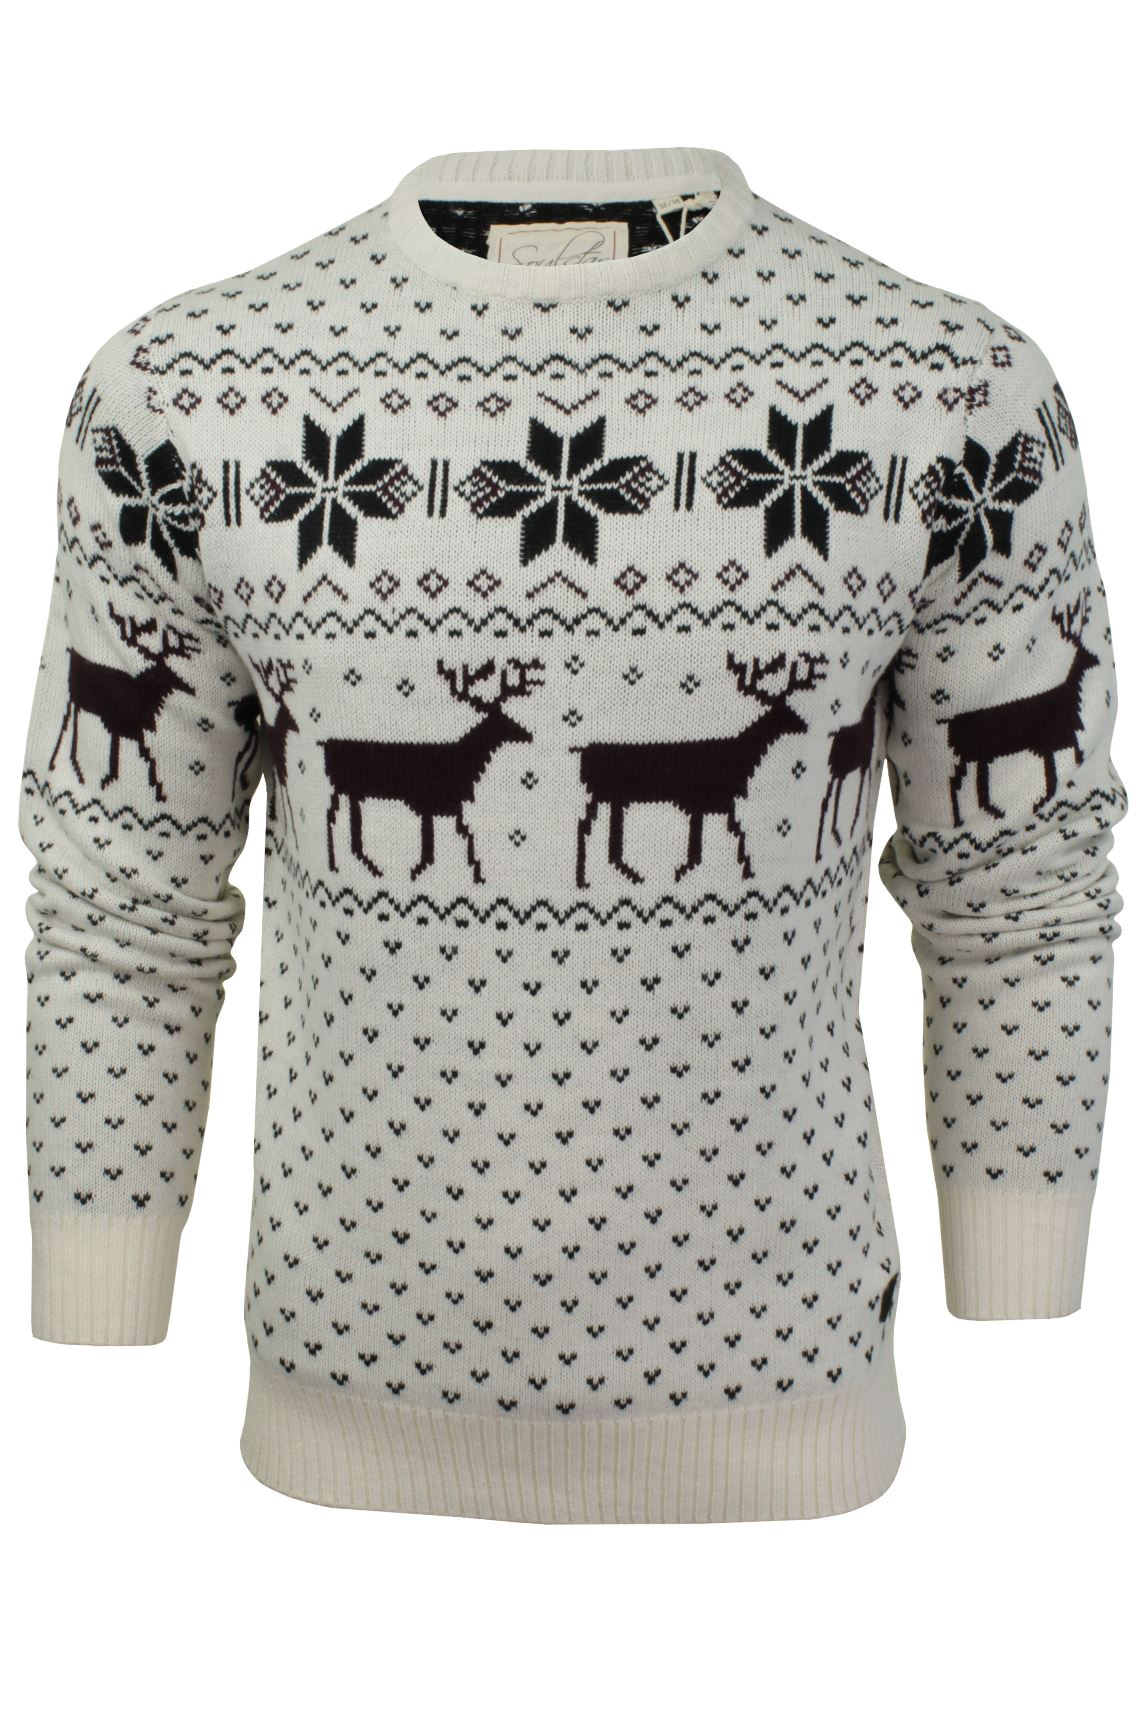 Knitting Patterns Mens Xmas Jumpers : Mens Christmas Jumper by Soul Star eBay